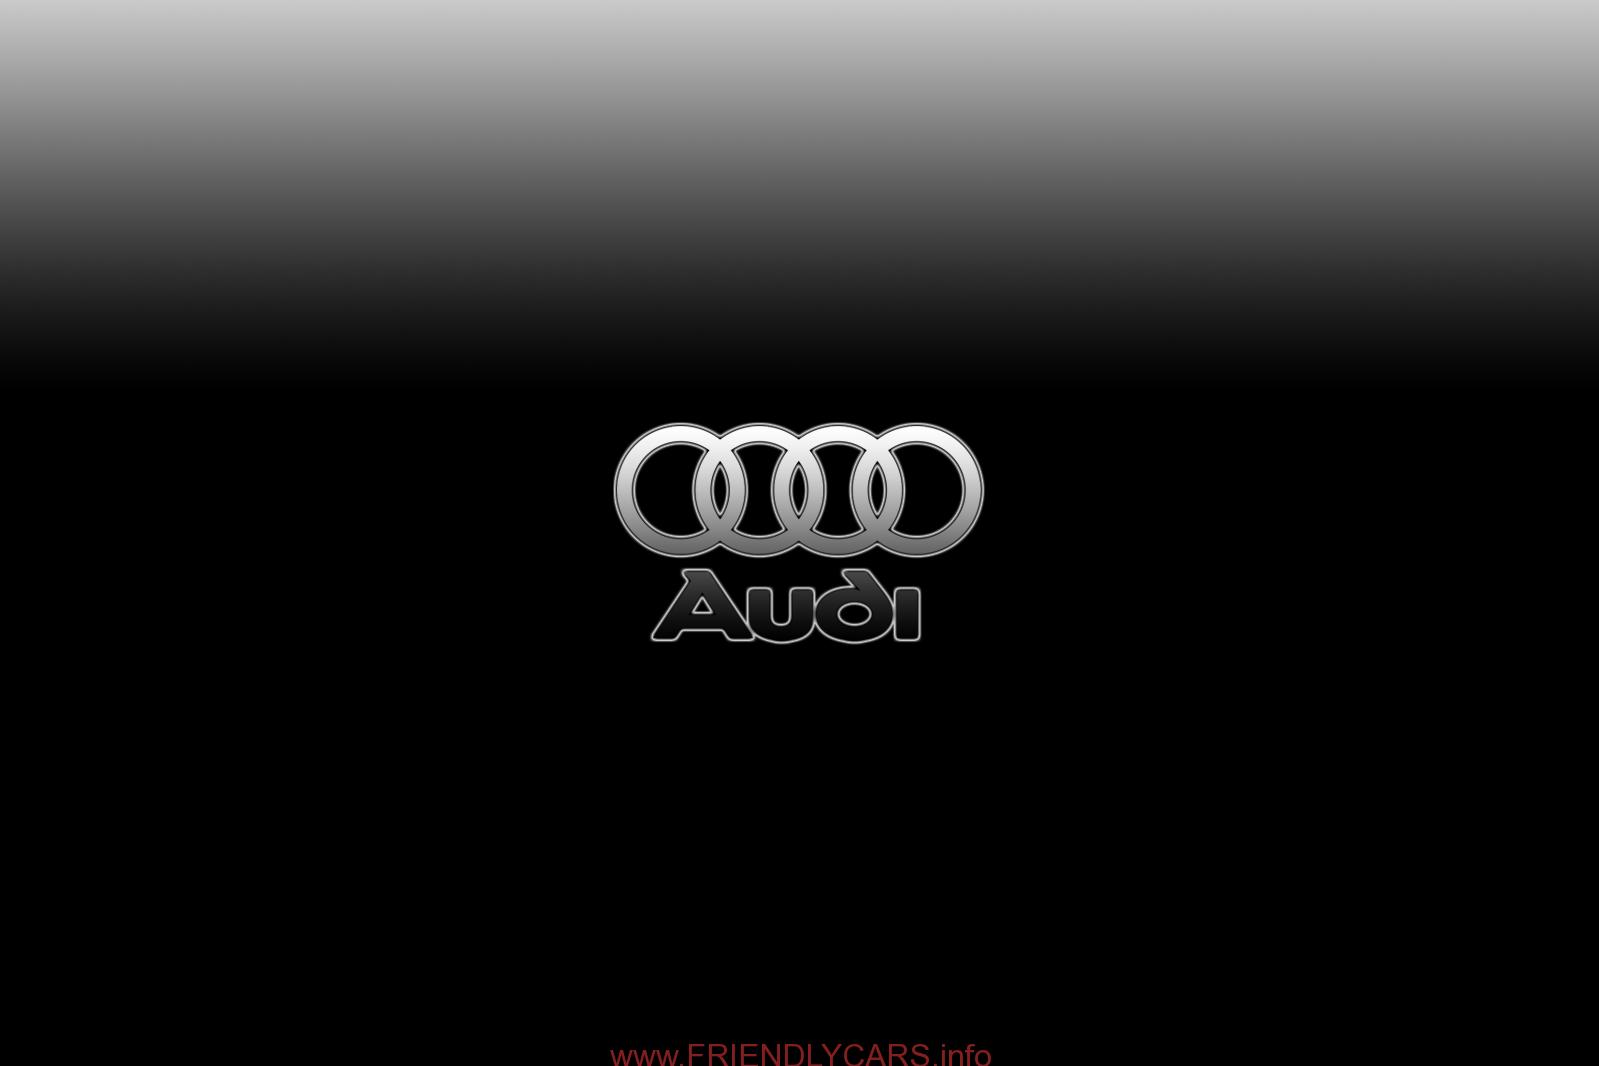 nice mercedes benz logo vector car images hd audi logo the car logo and short info